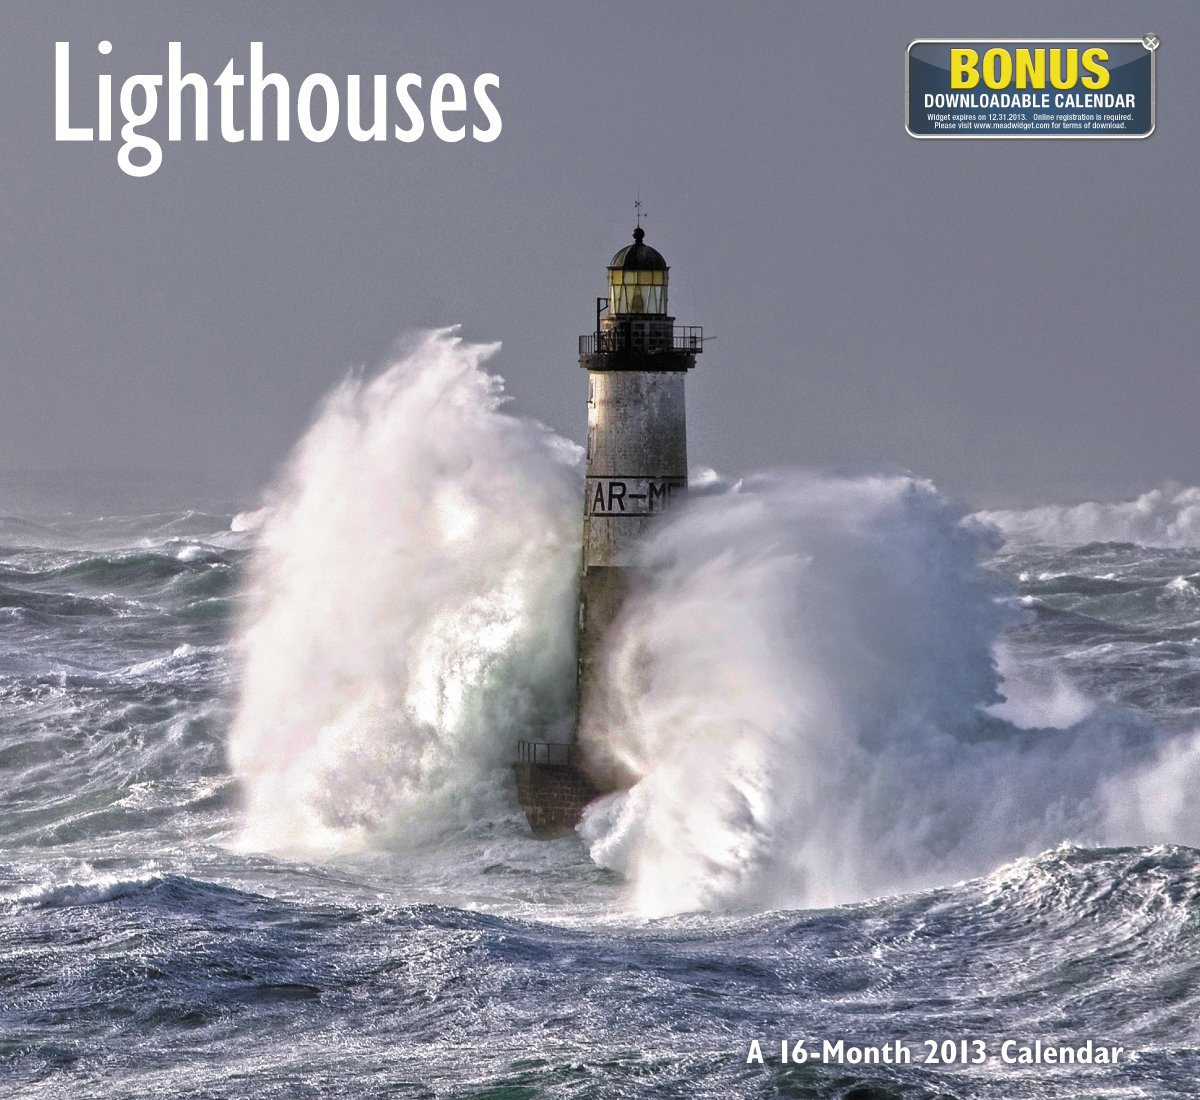 Lighthouses 2013 Calendar  Access Code For Downloadable Calendar